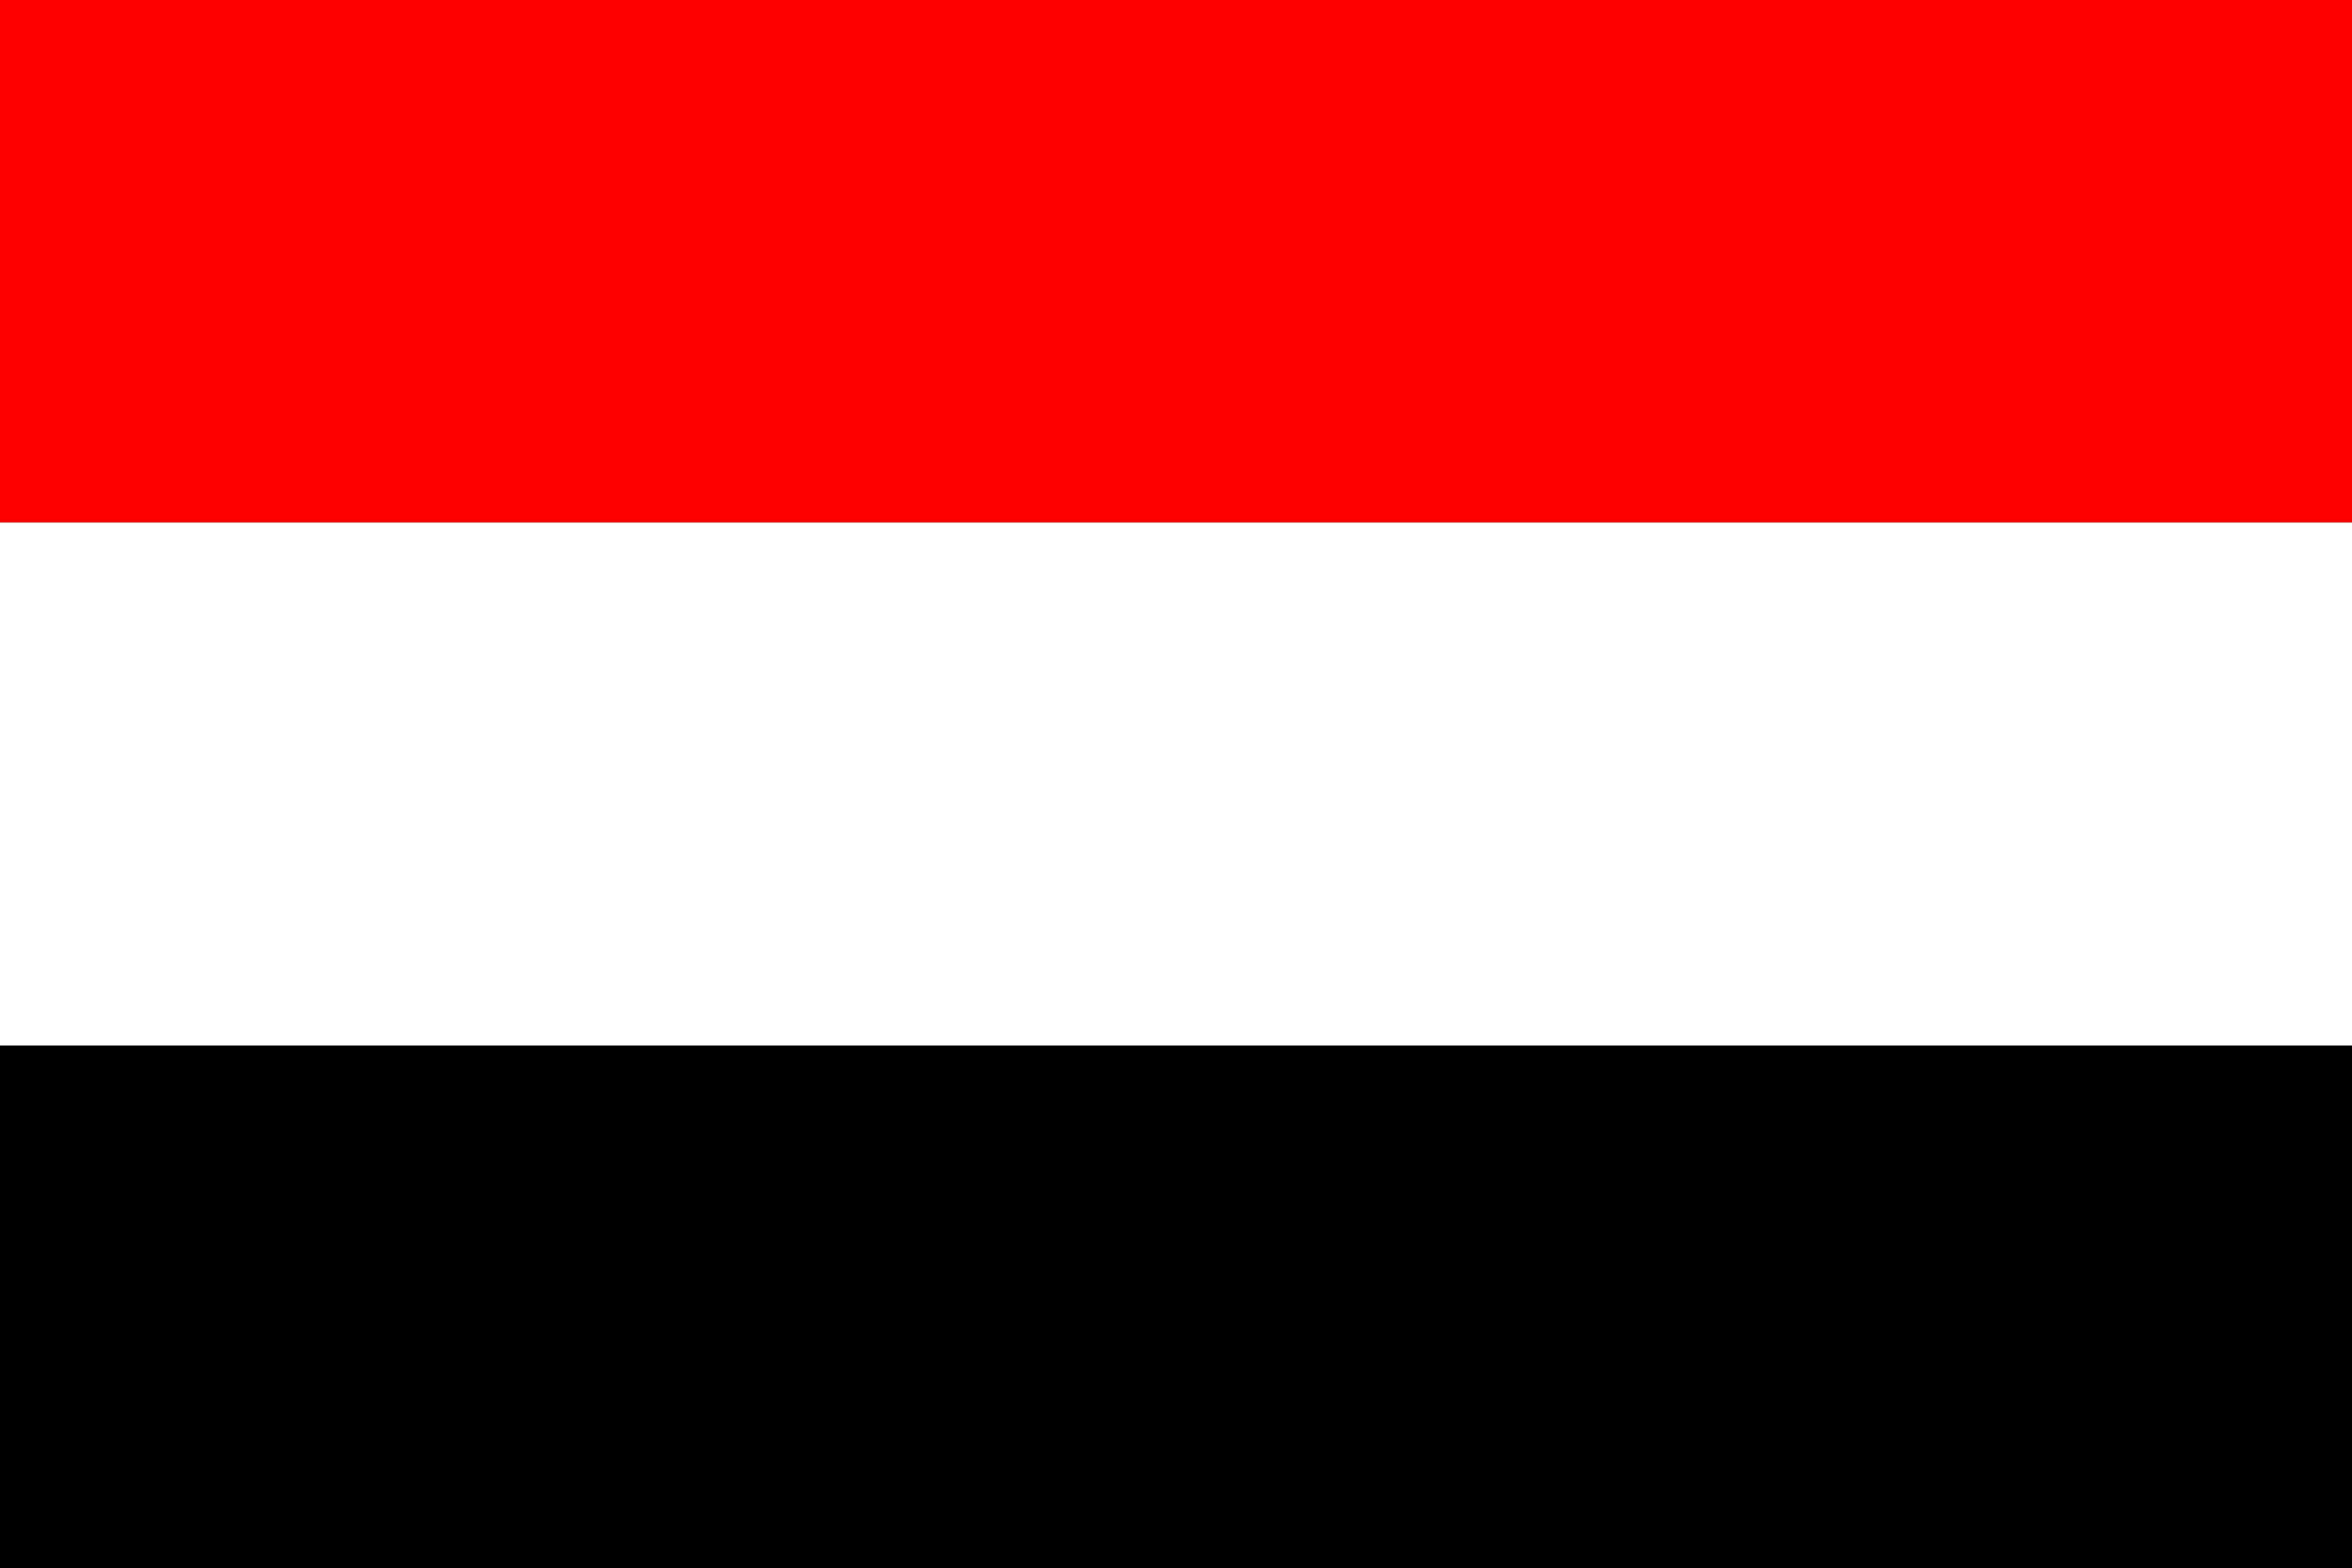 Wallpaper Yemen Flag Stripes 4497x2998